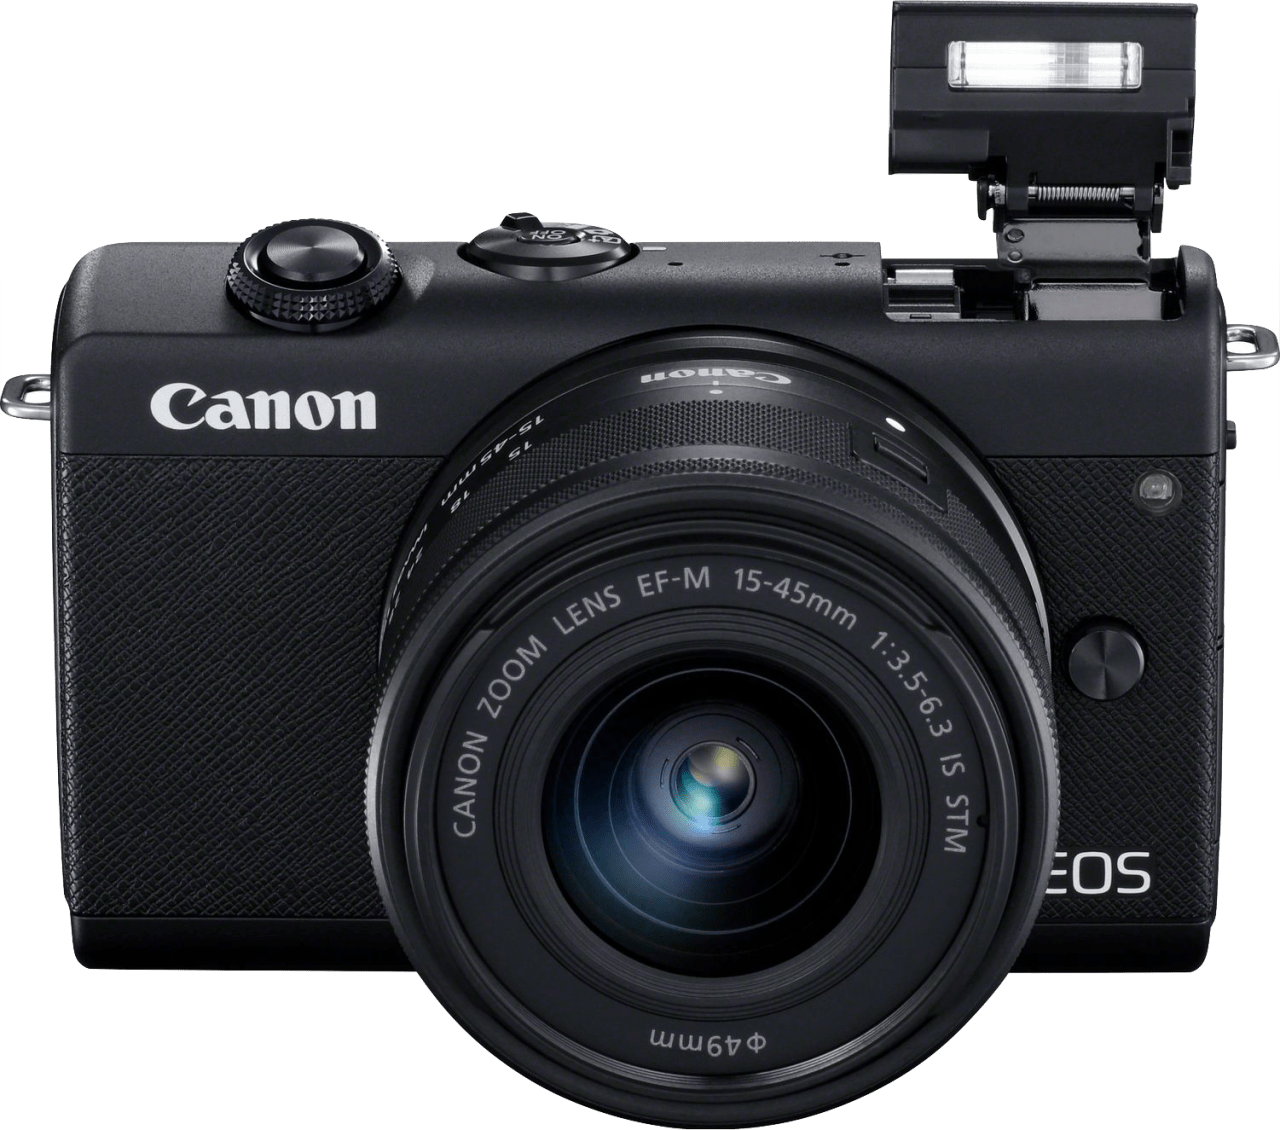 Schwarz Canon EOS M200 Kit (EF-M 15 - 45mm Lens).2